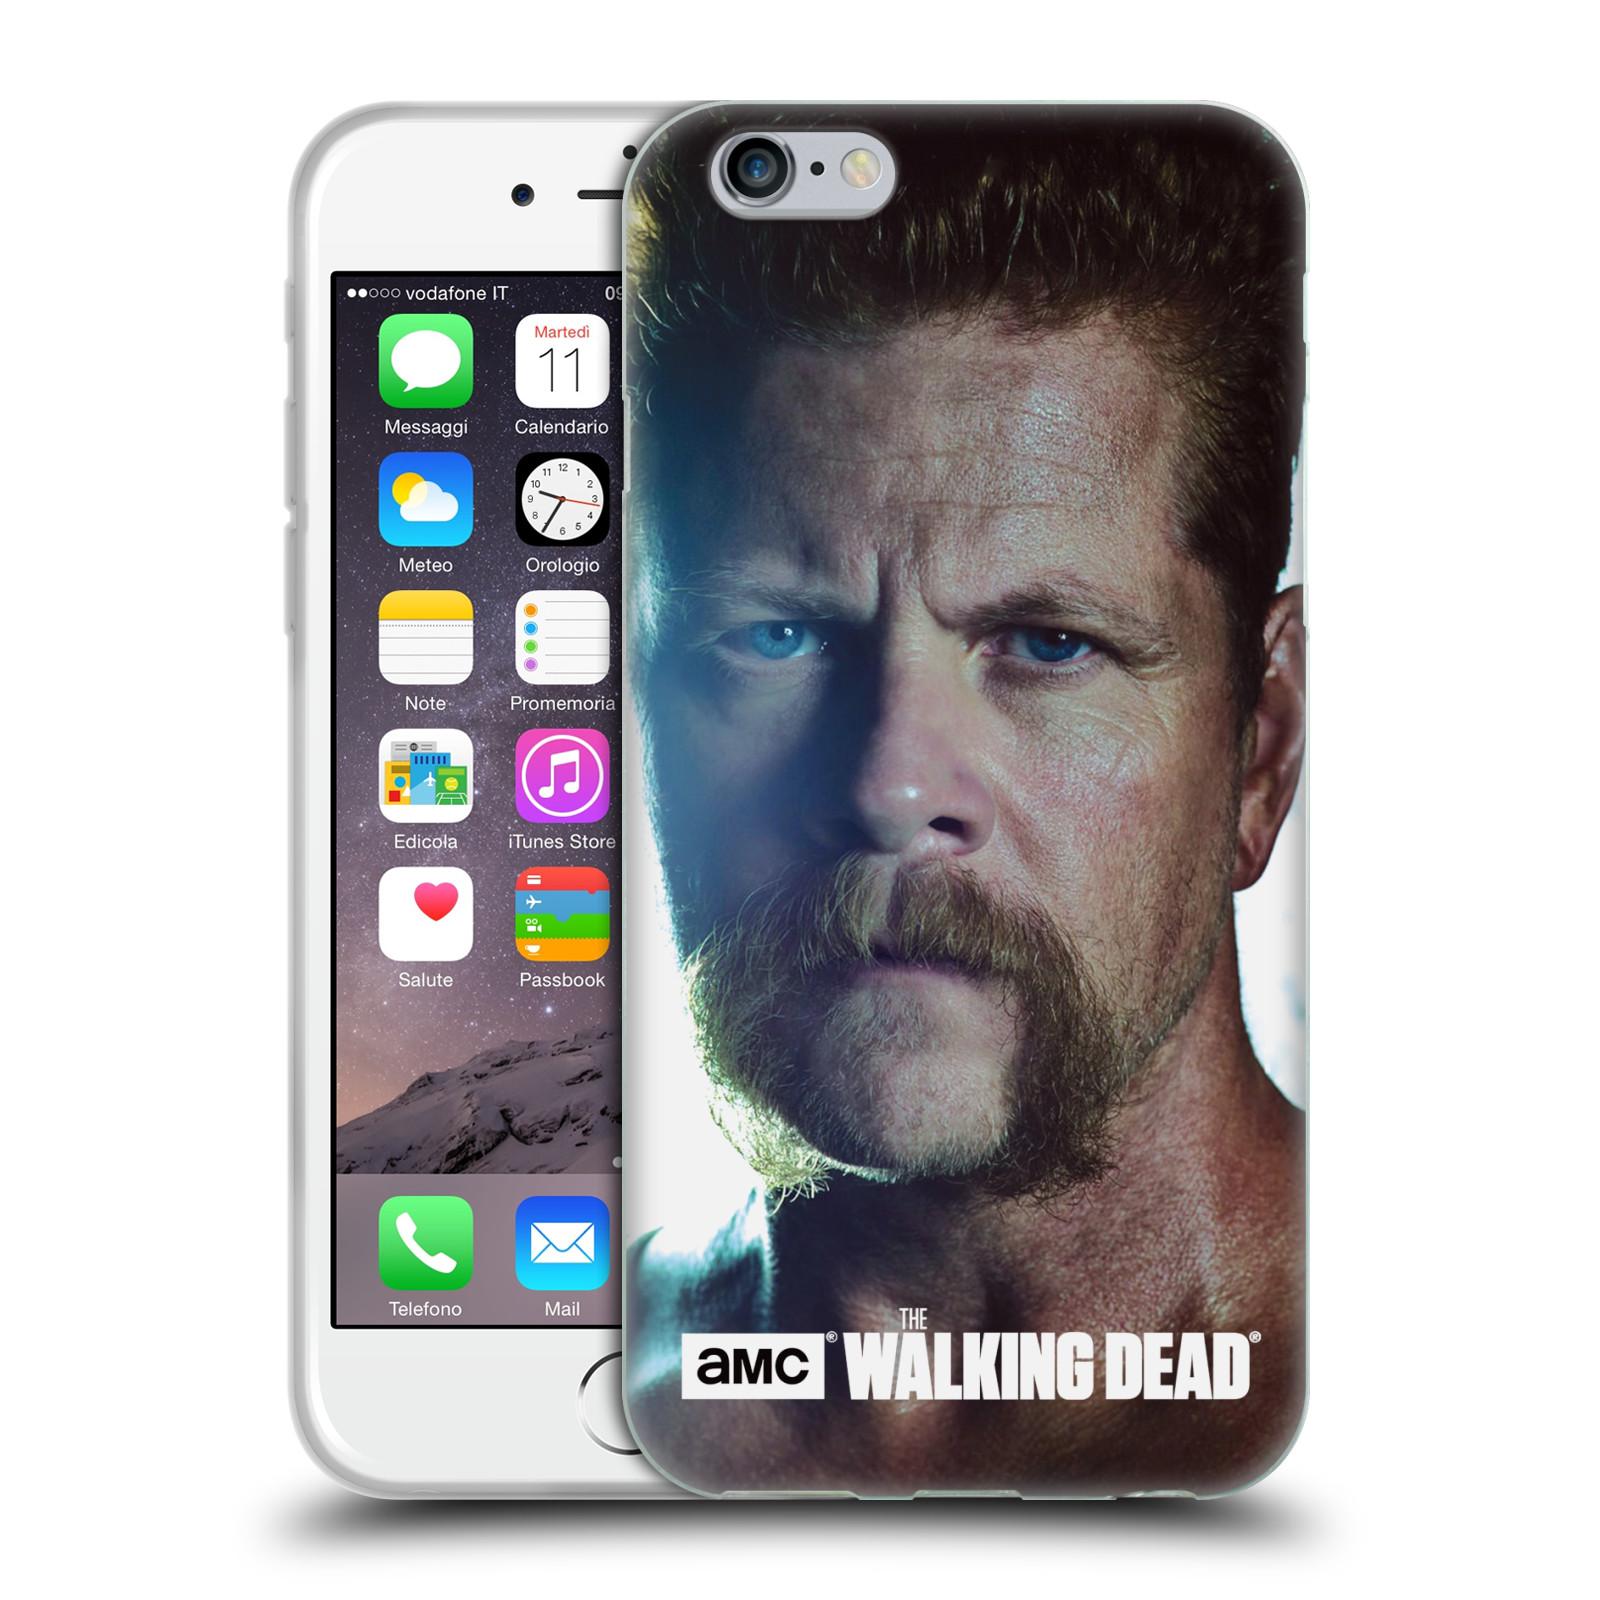 HEAD CASE silikonový obal na mobil Apple Iphone 6 / 6S originální potisk Walking Dead postavy Abraham